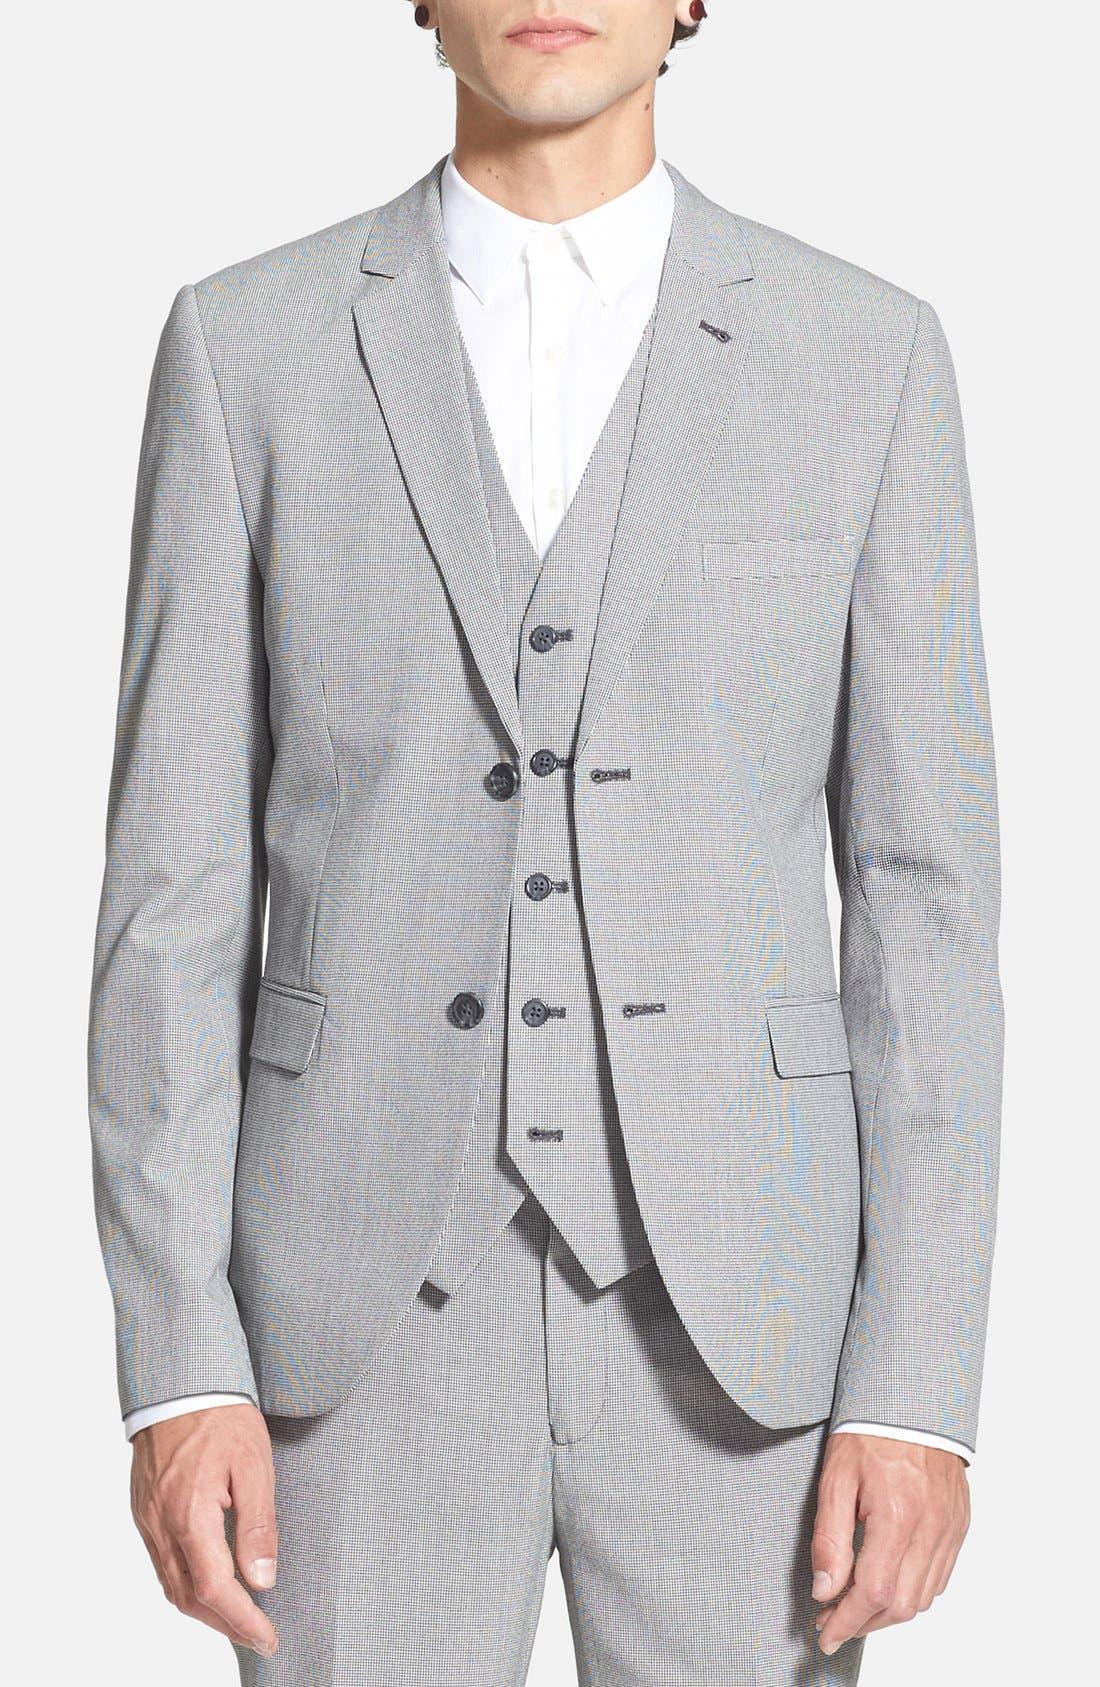 Main Image - Topman Skinny Fit Micro Houndstooth Suit Jacket